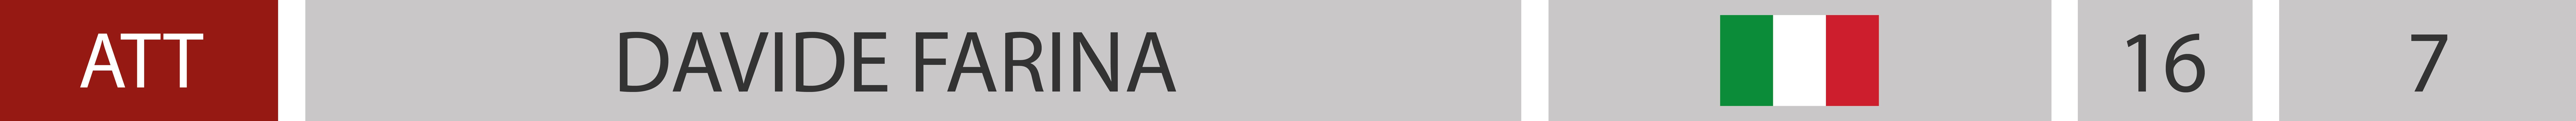 davide-farinatab